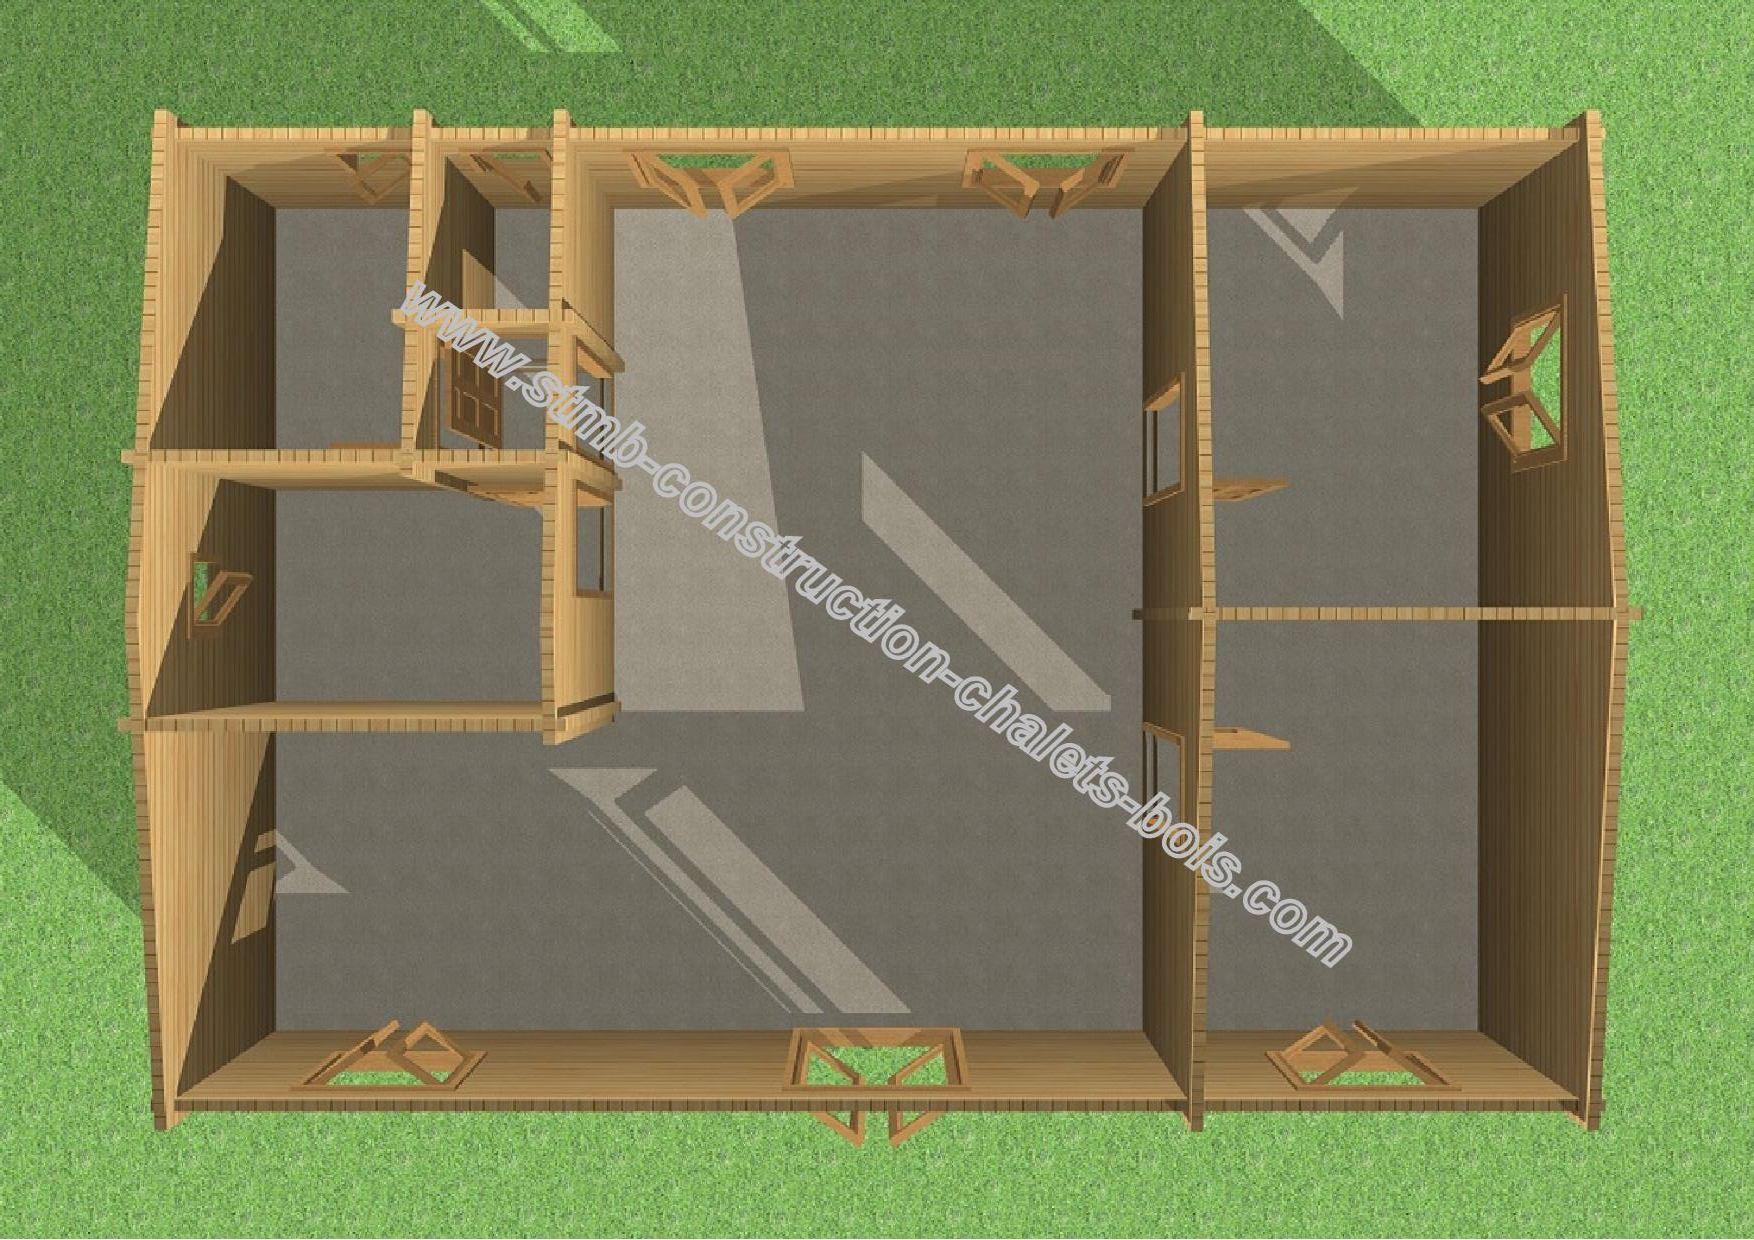 chalet bois habitable vendu en kit valence de 92 m2. Black Bedroom Furniture Sets. Home Design Ideas